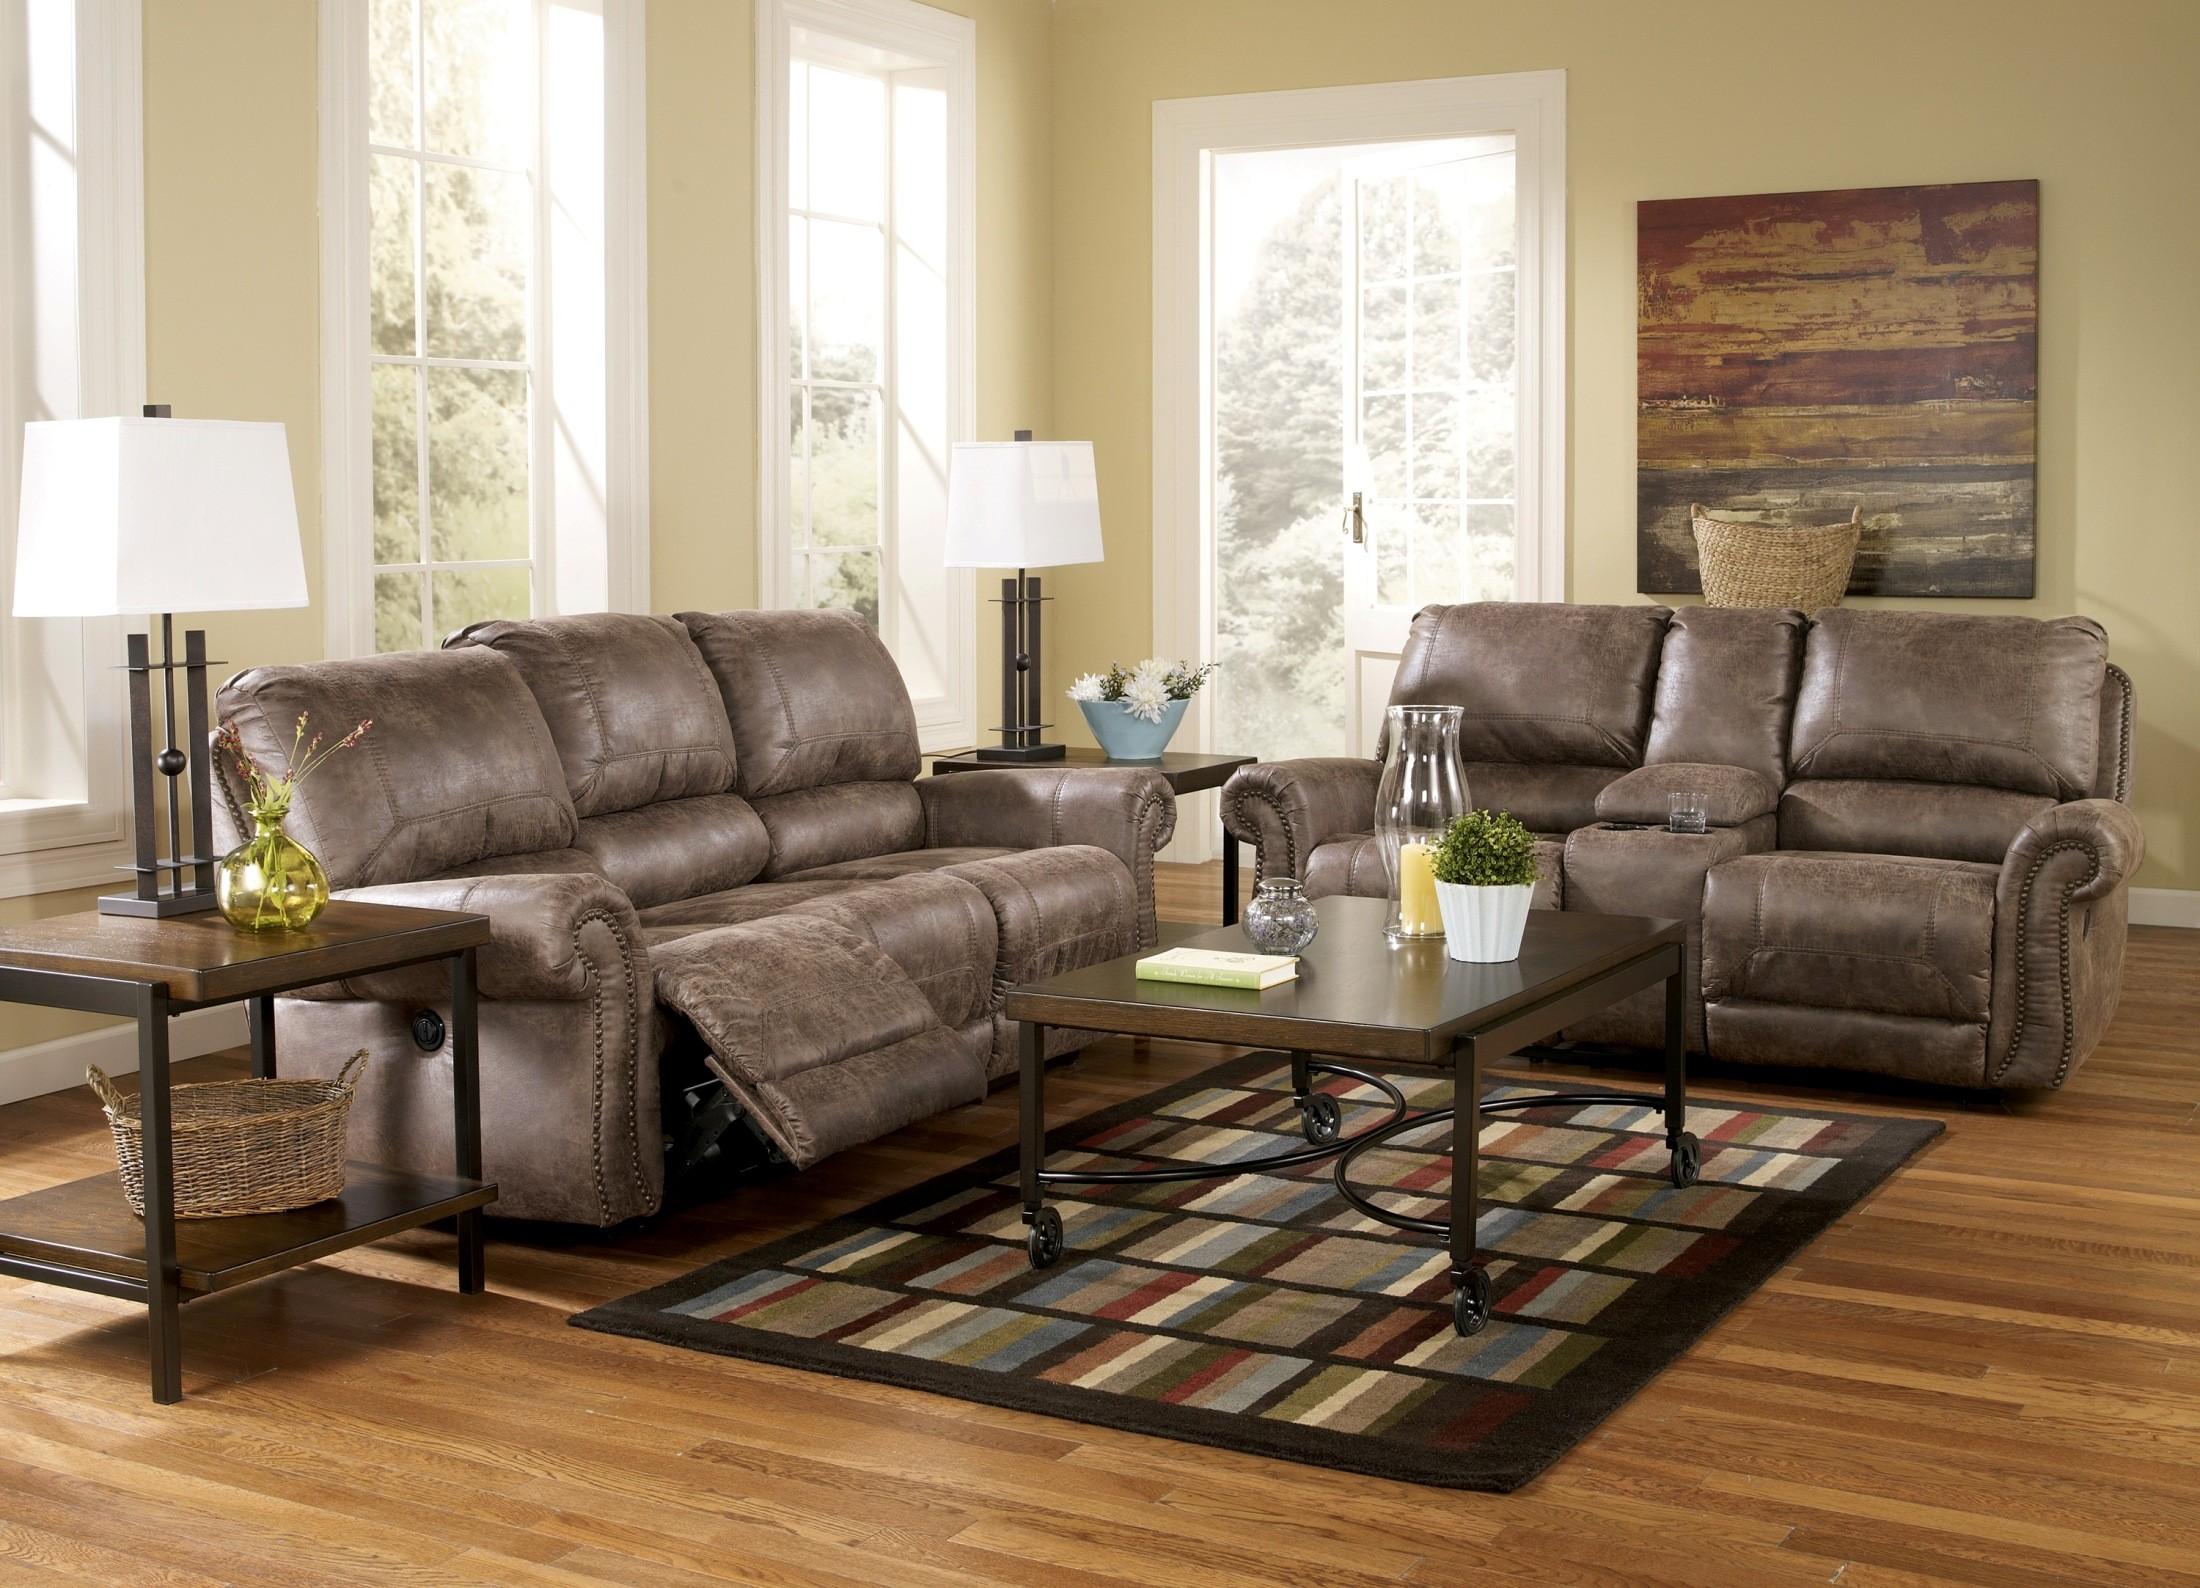 Living Room Sets Austin Tx oberson gunsmoke reclining living room set from ashley (74100